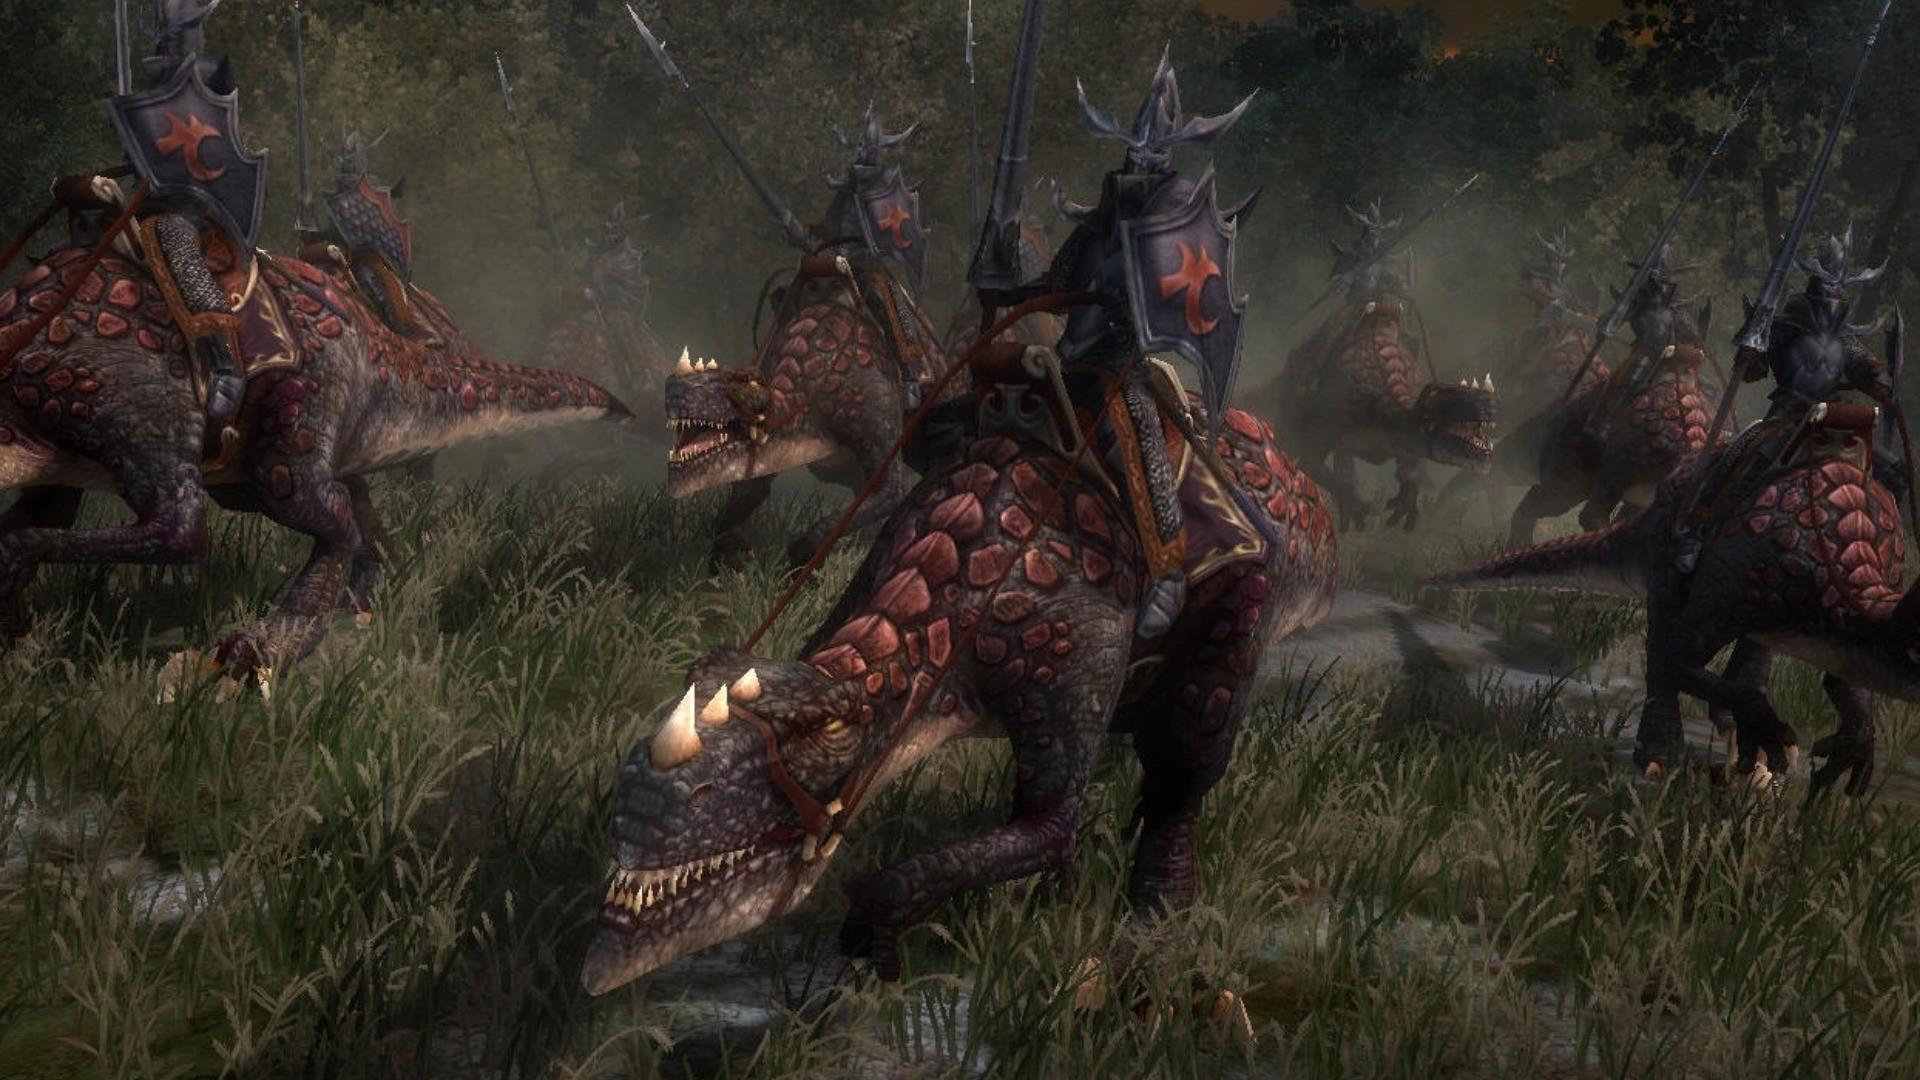 fantasy dinosaur - DriverLayer Search Engine